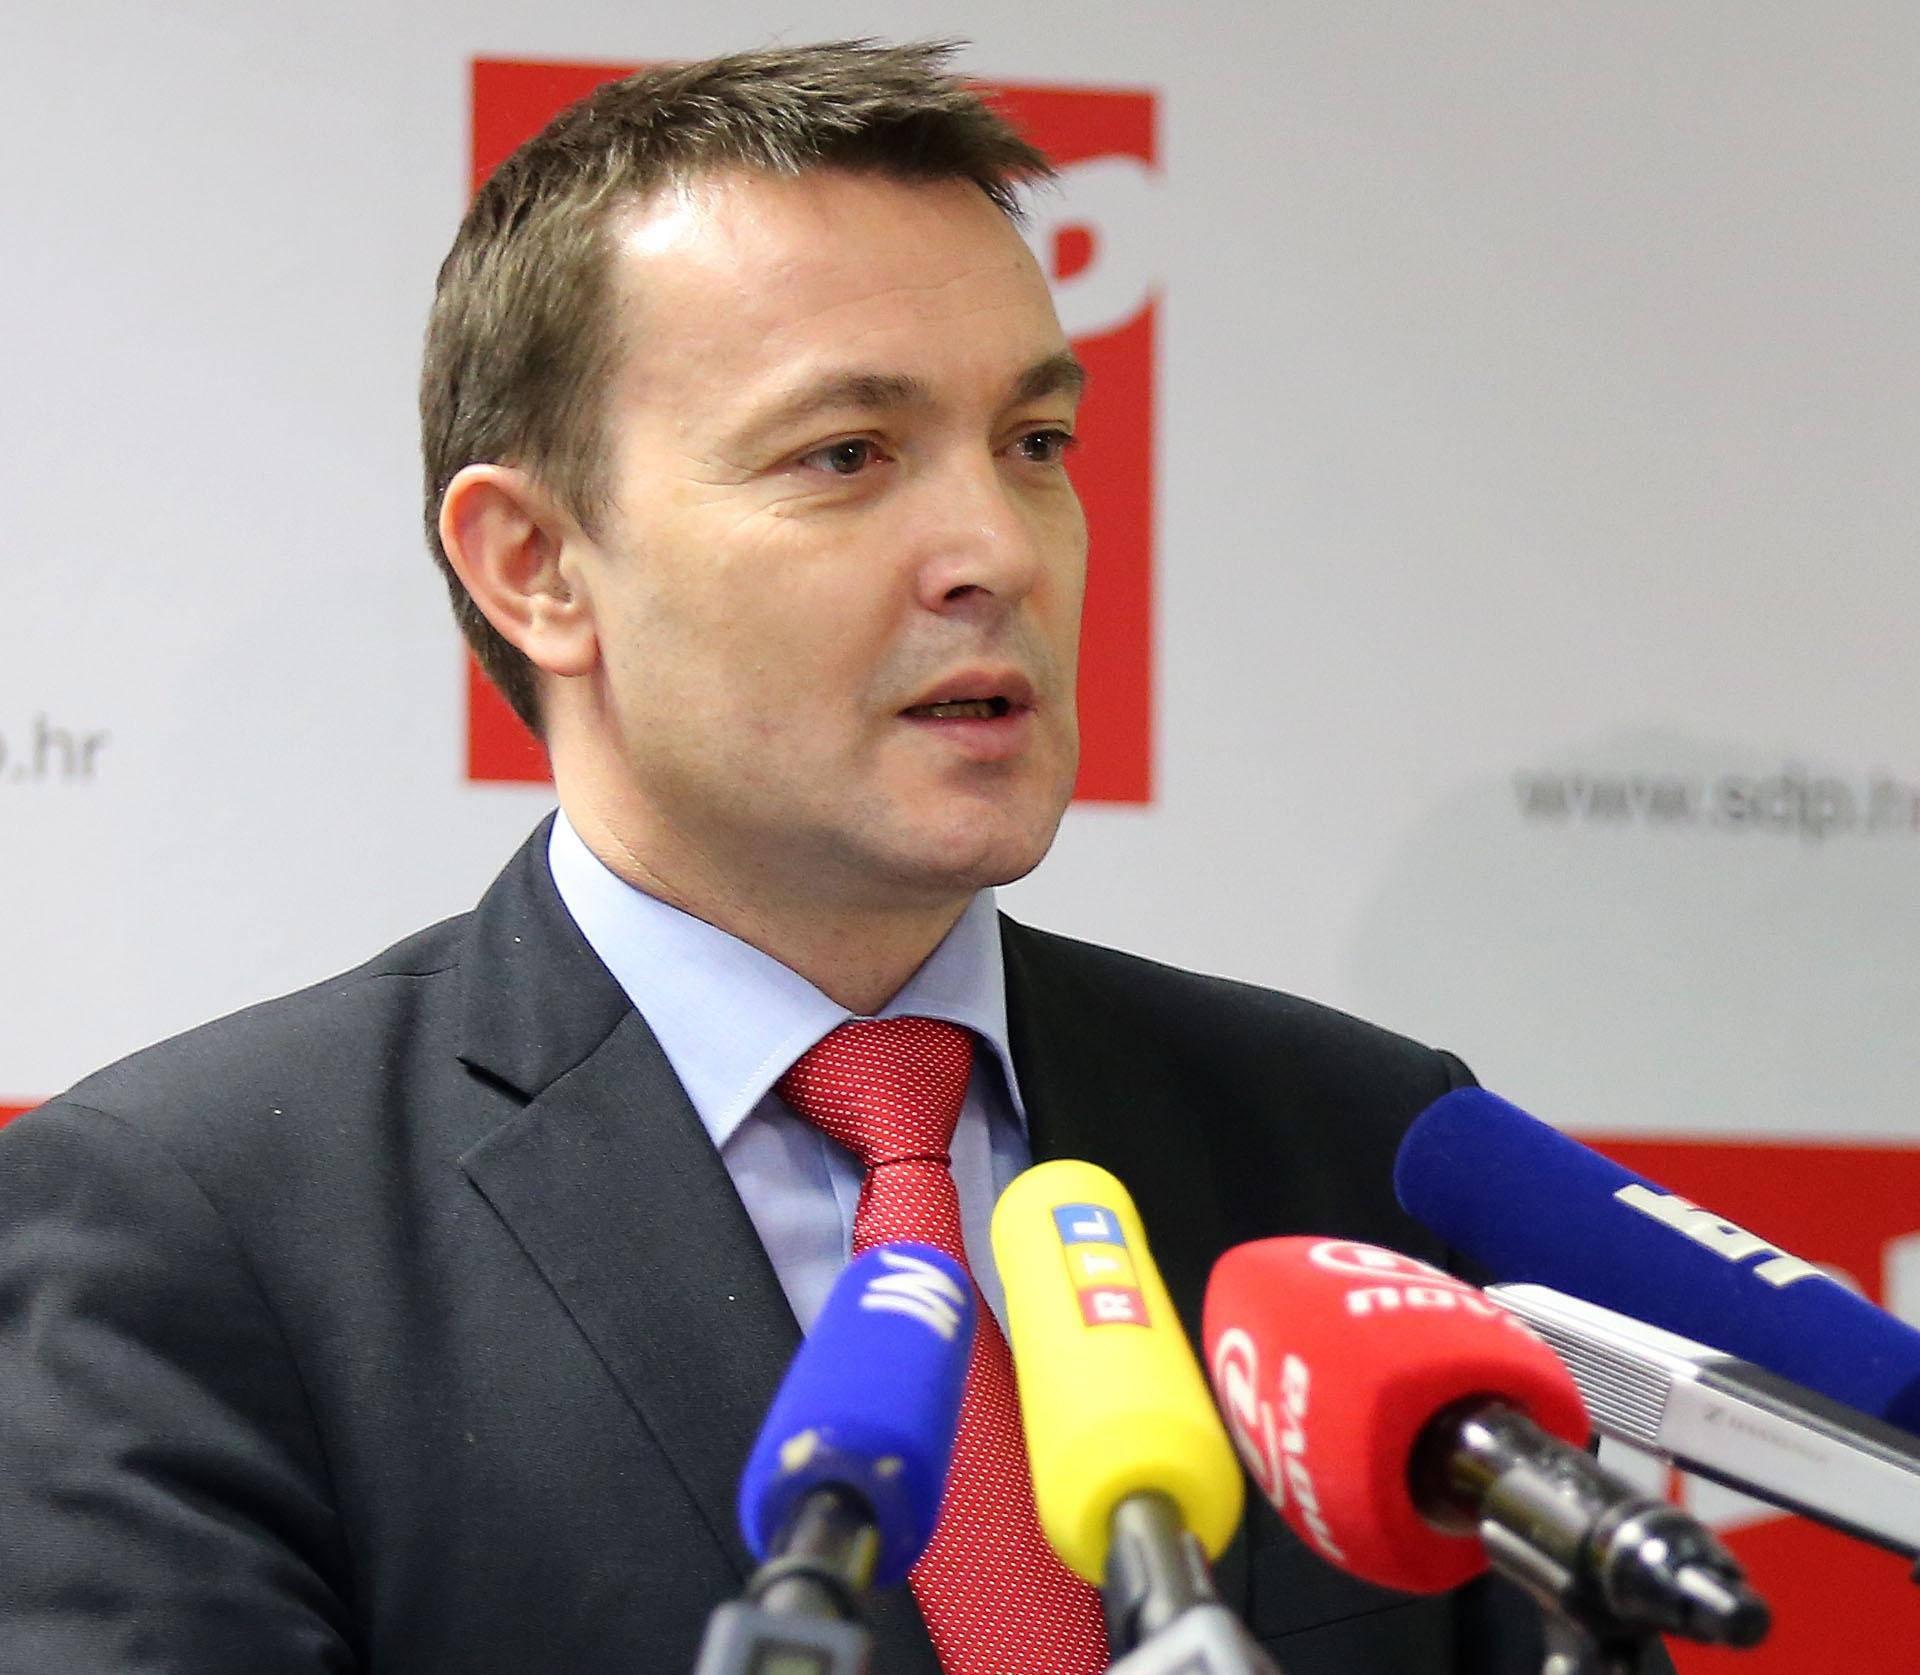 Plenković žrtvovao Kuščevića kako bi spasio sebe, kaže Bauk